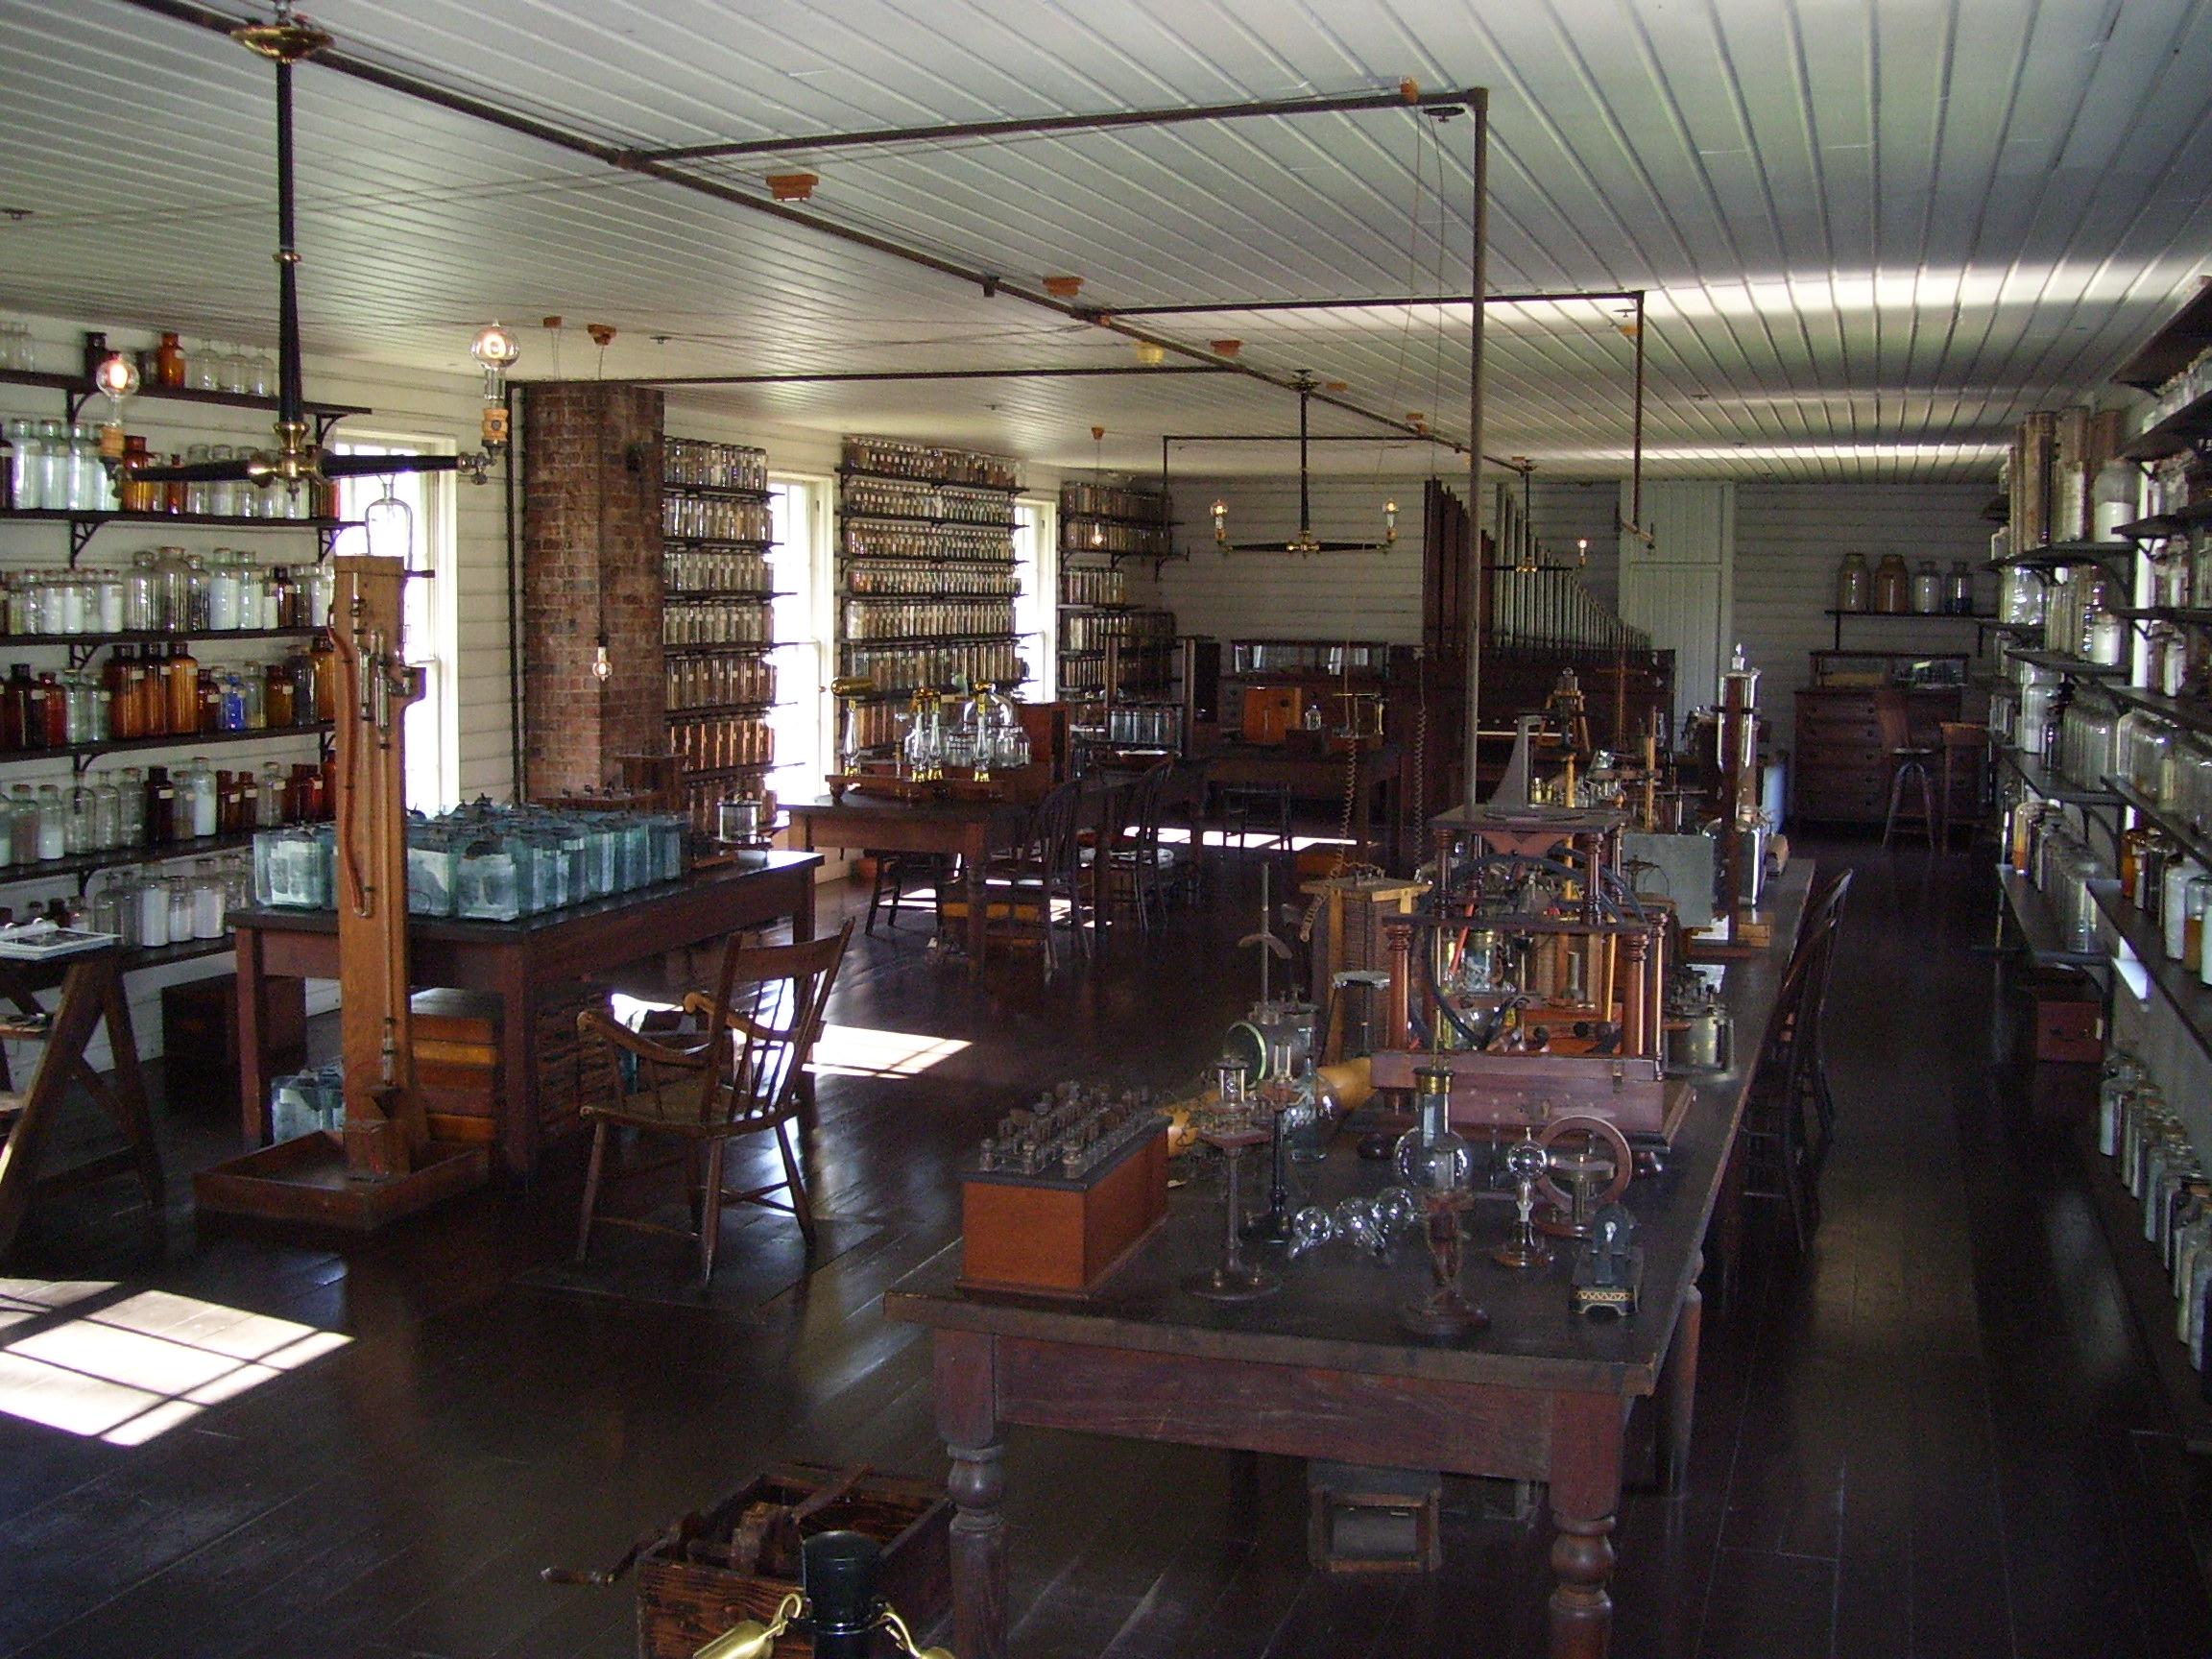 file menlo park laboratory of thomas edison site of the